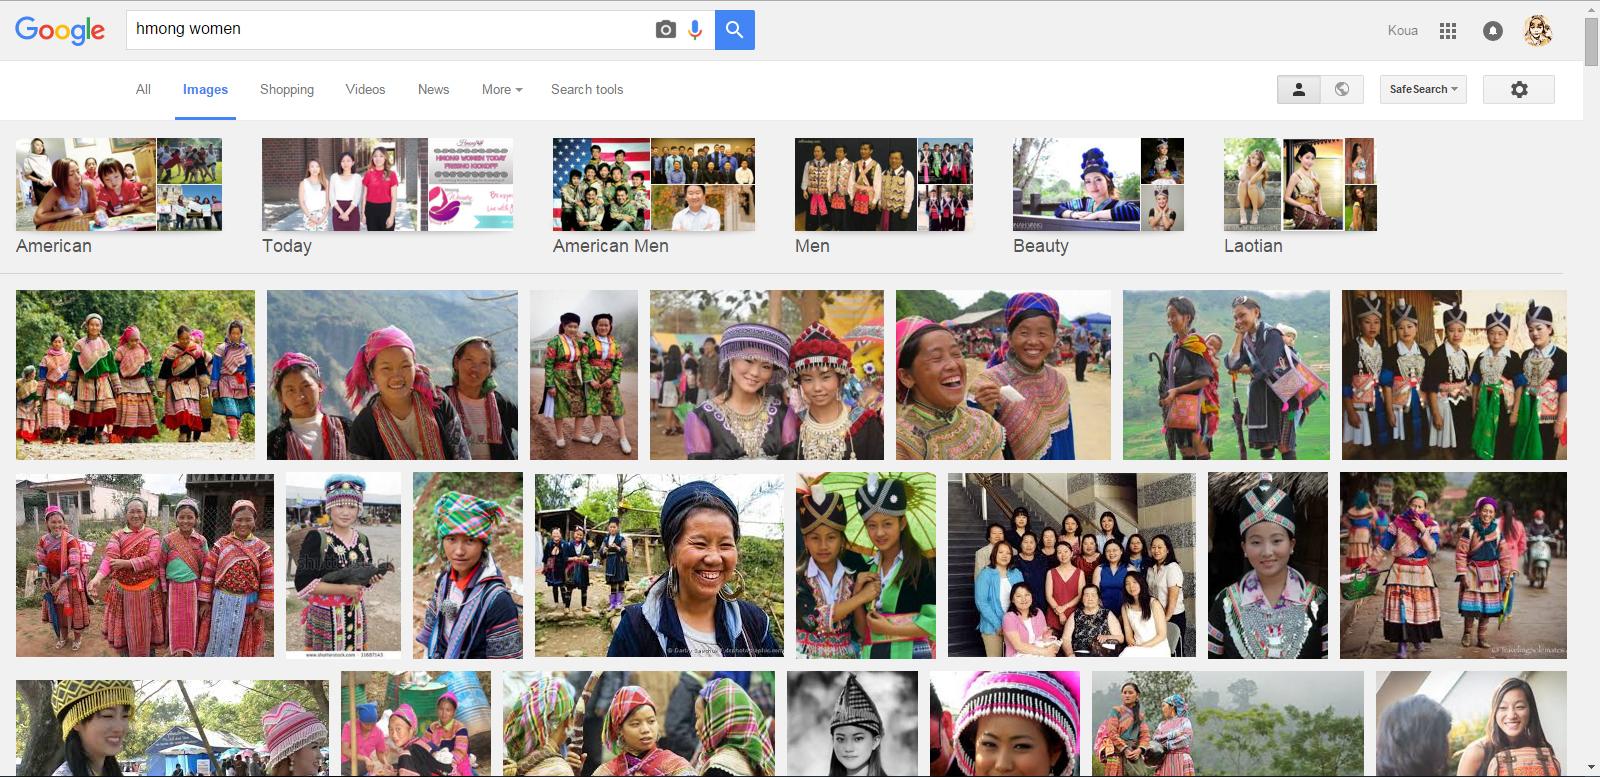 Googling Hmong Women